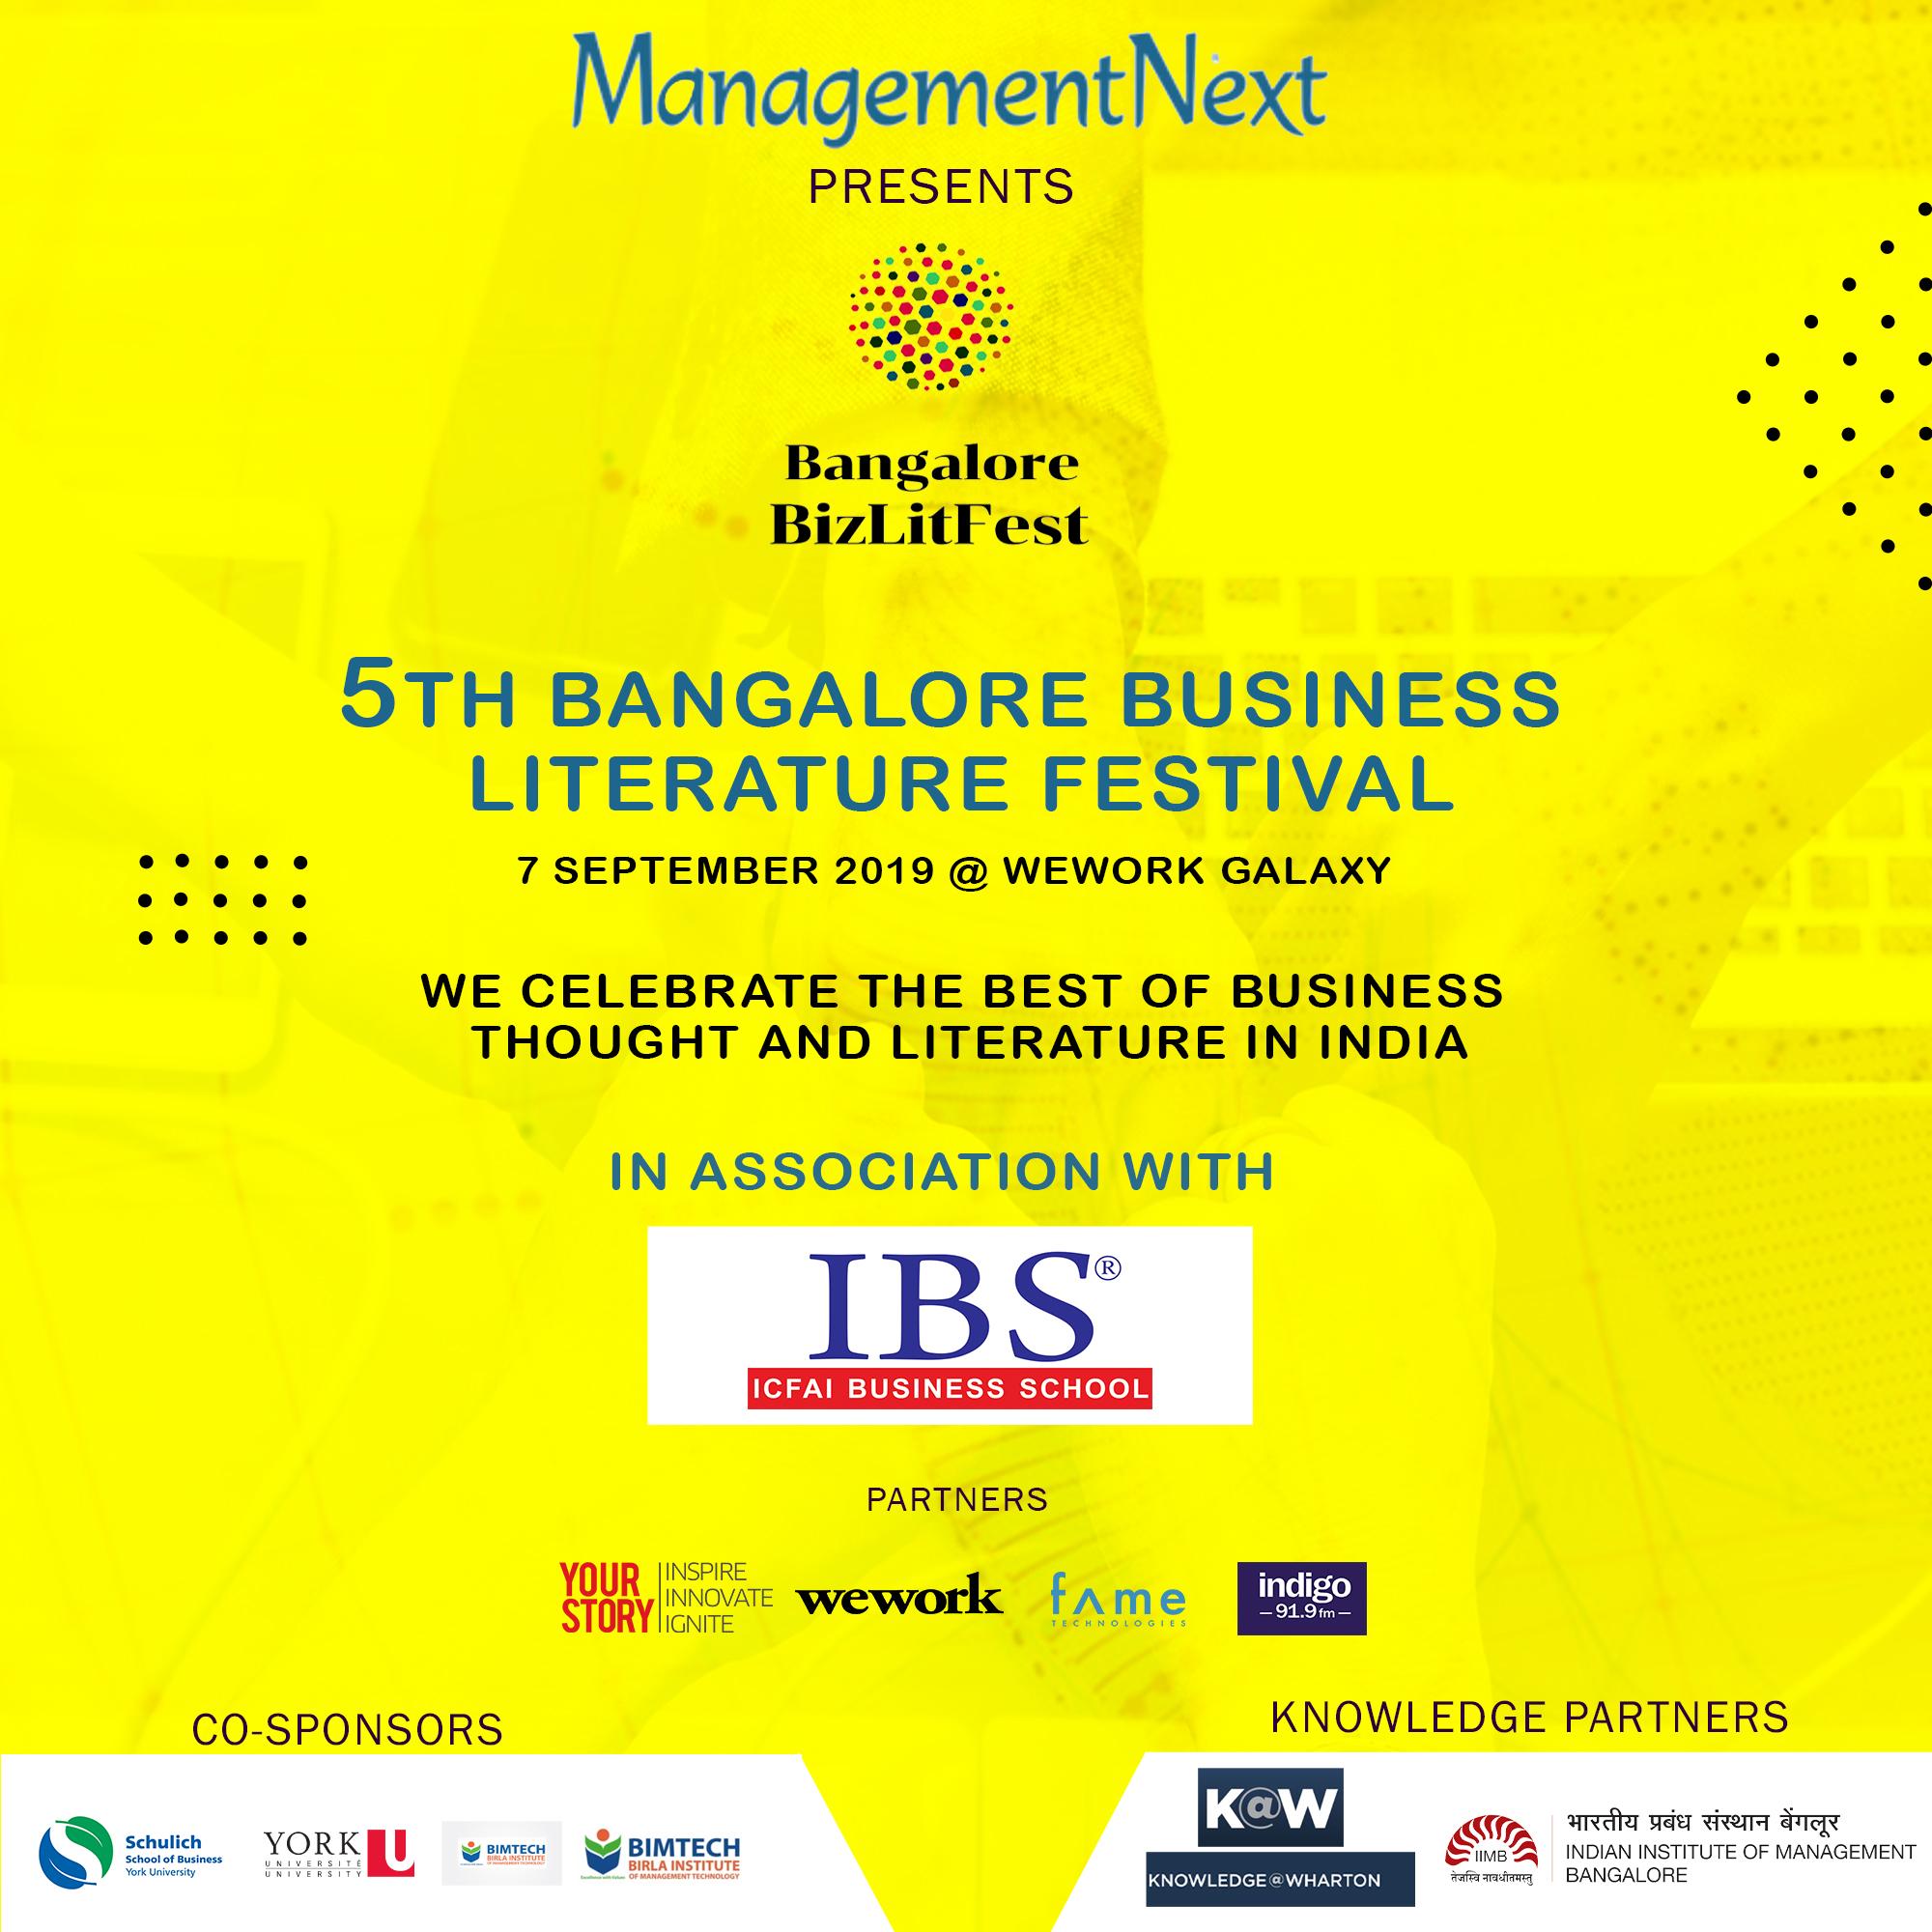 $108B Tata Capital partners with SME lending platform Biz2Credit